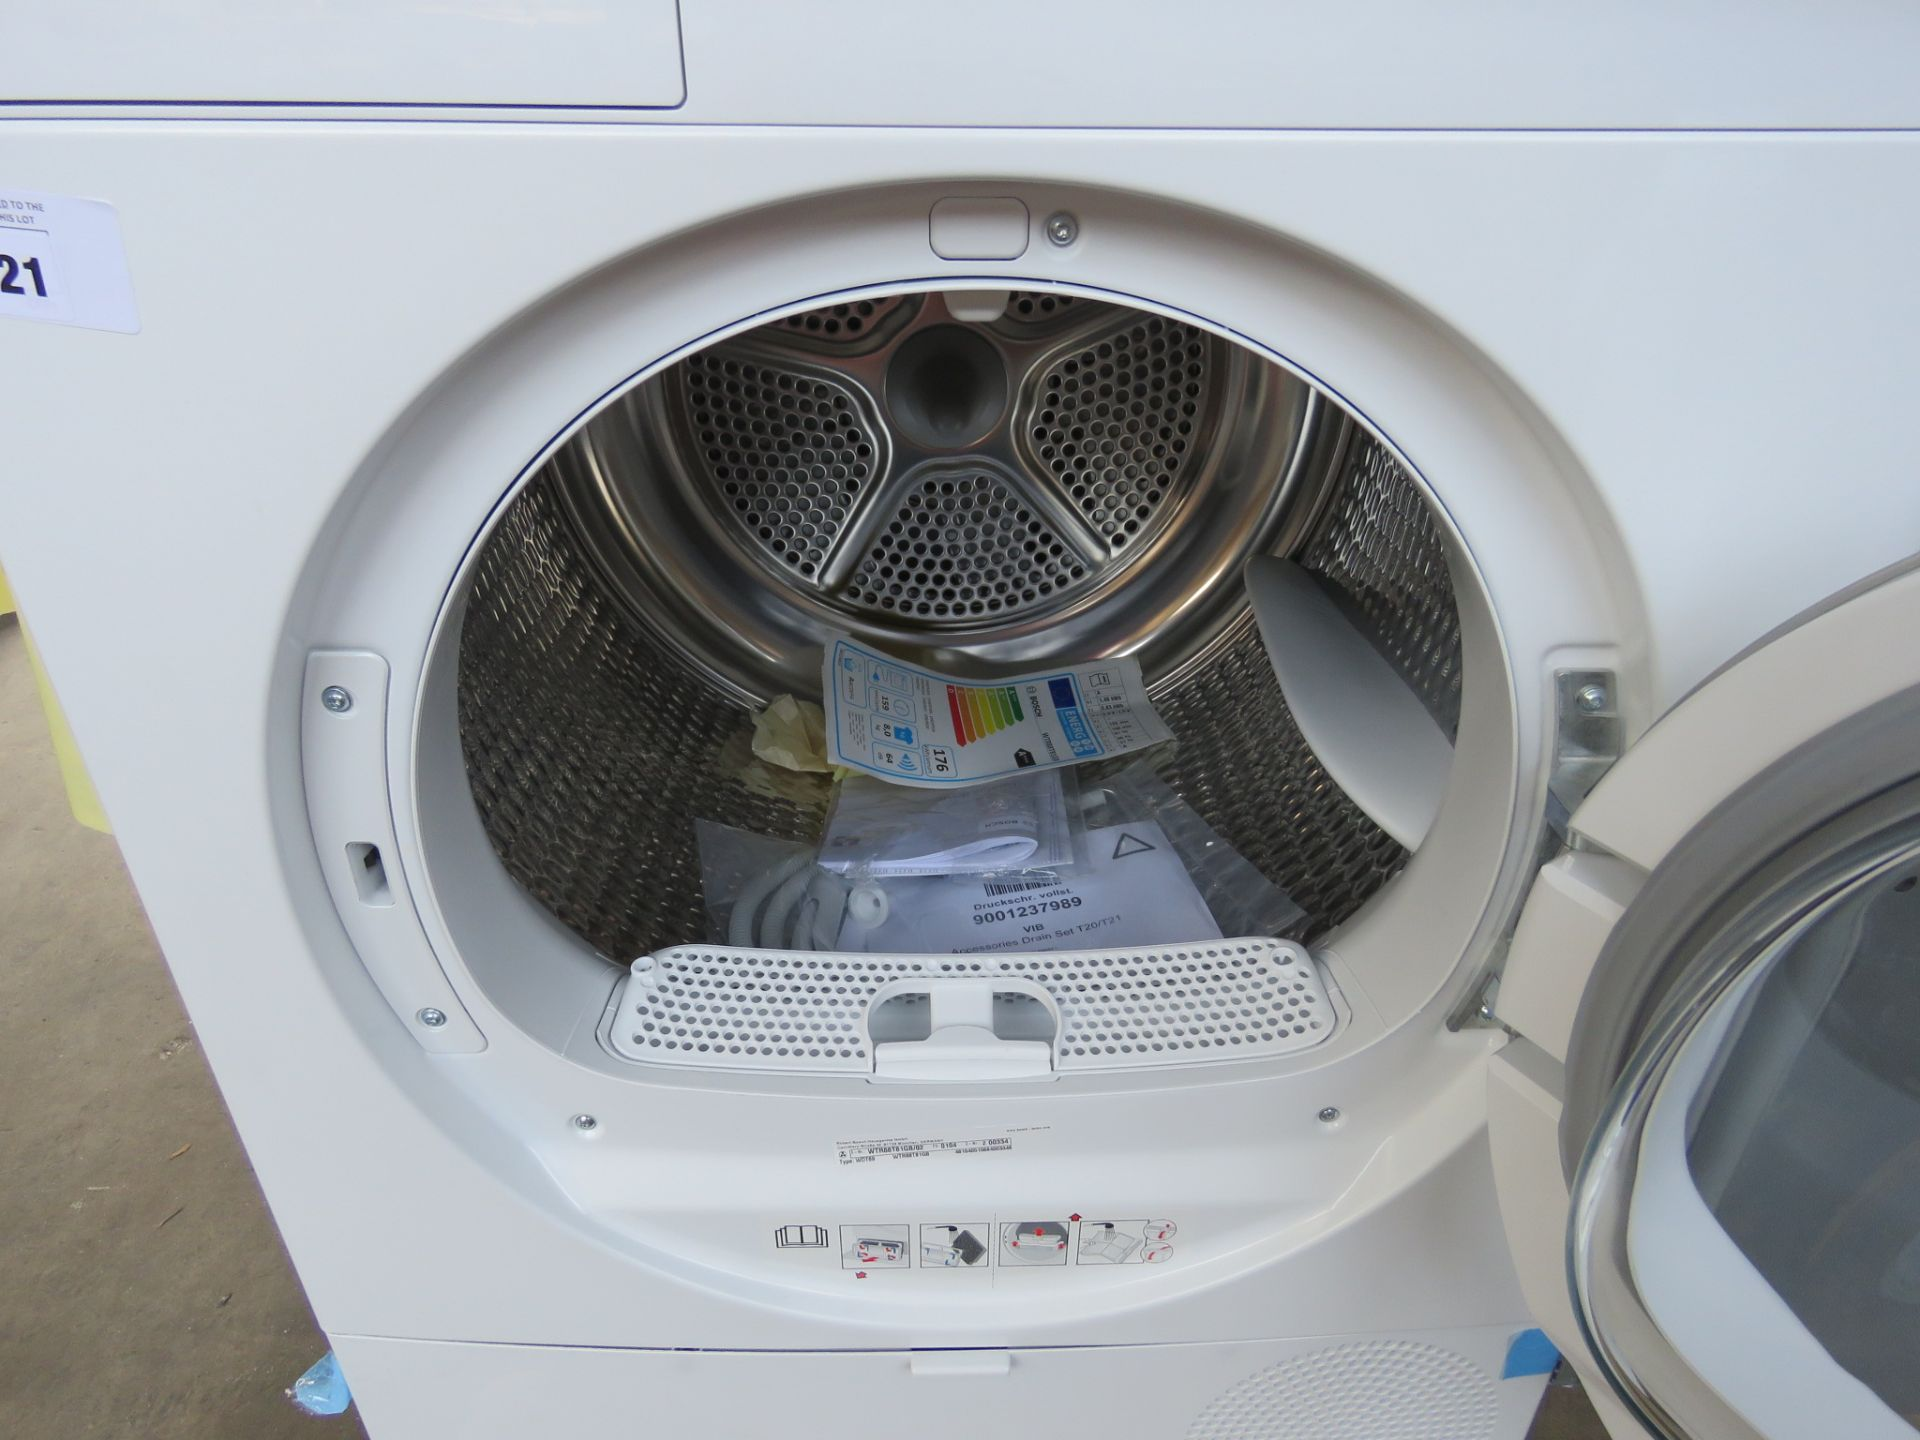 WTR88T81GBB Bosch Tumble dryer - Image 2 of 2